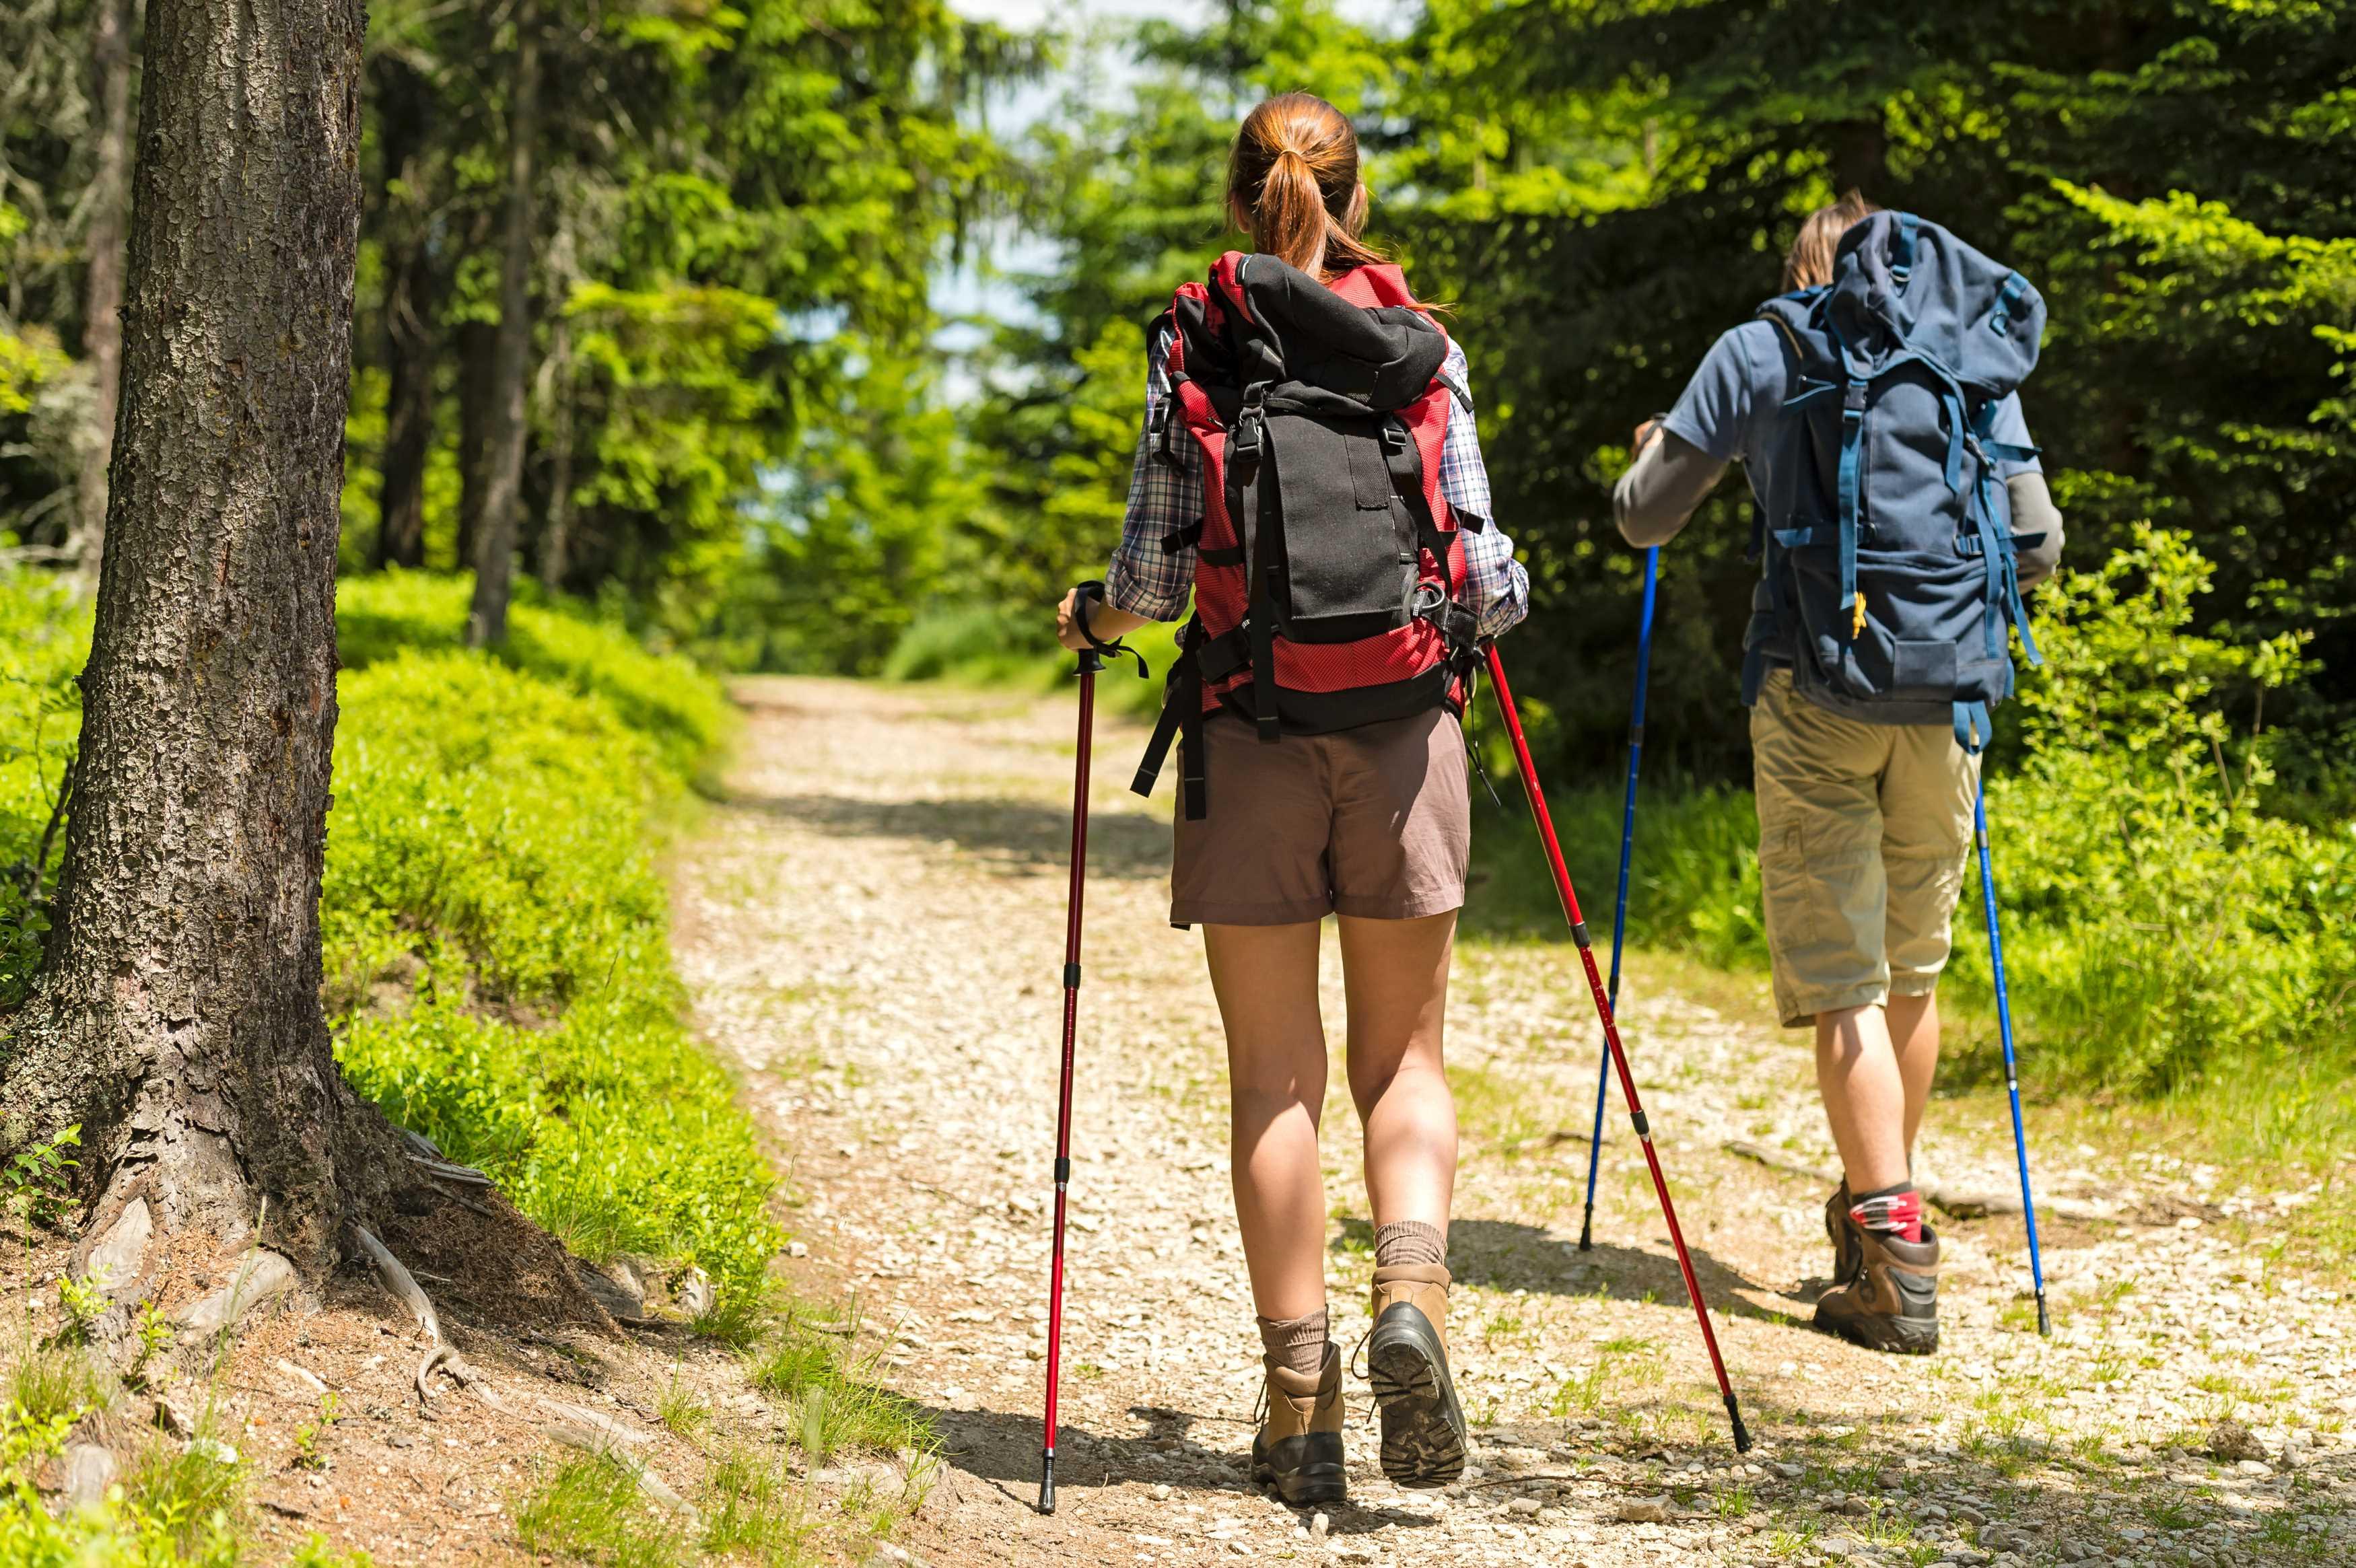 trekking with walking sticks